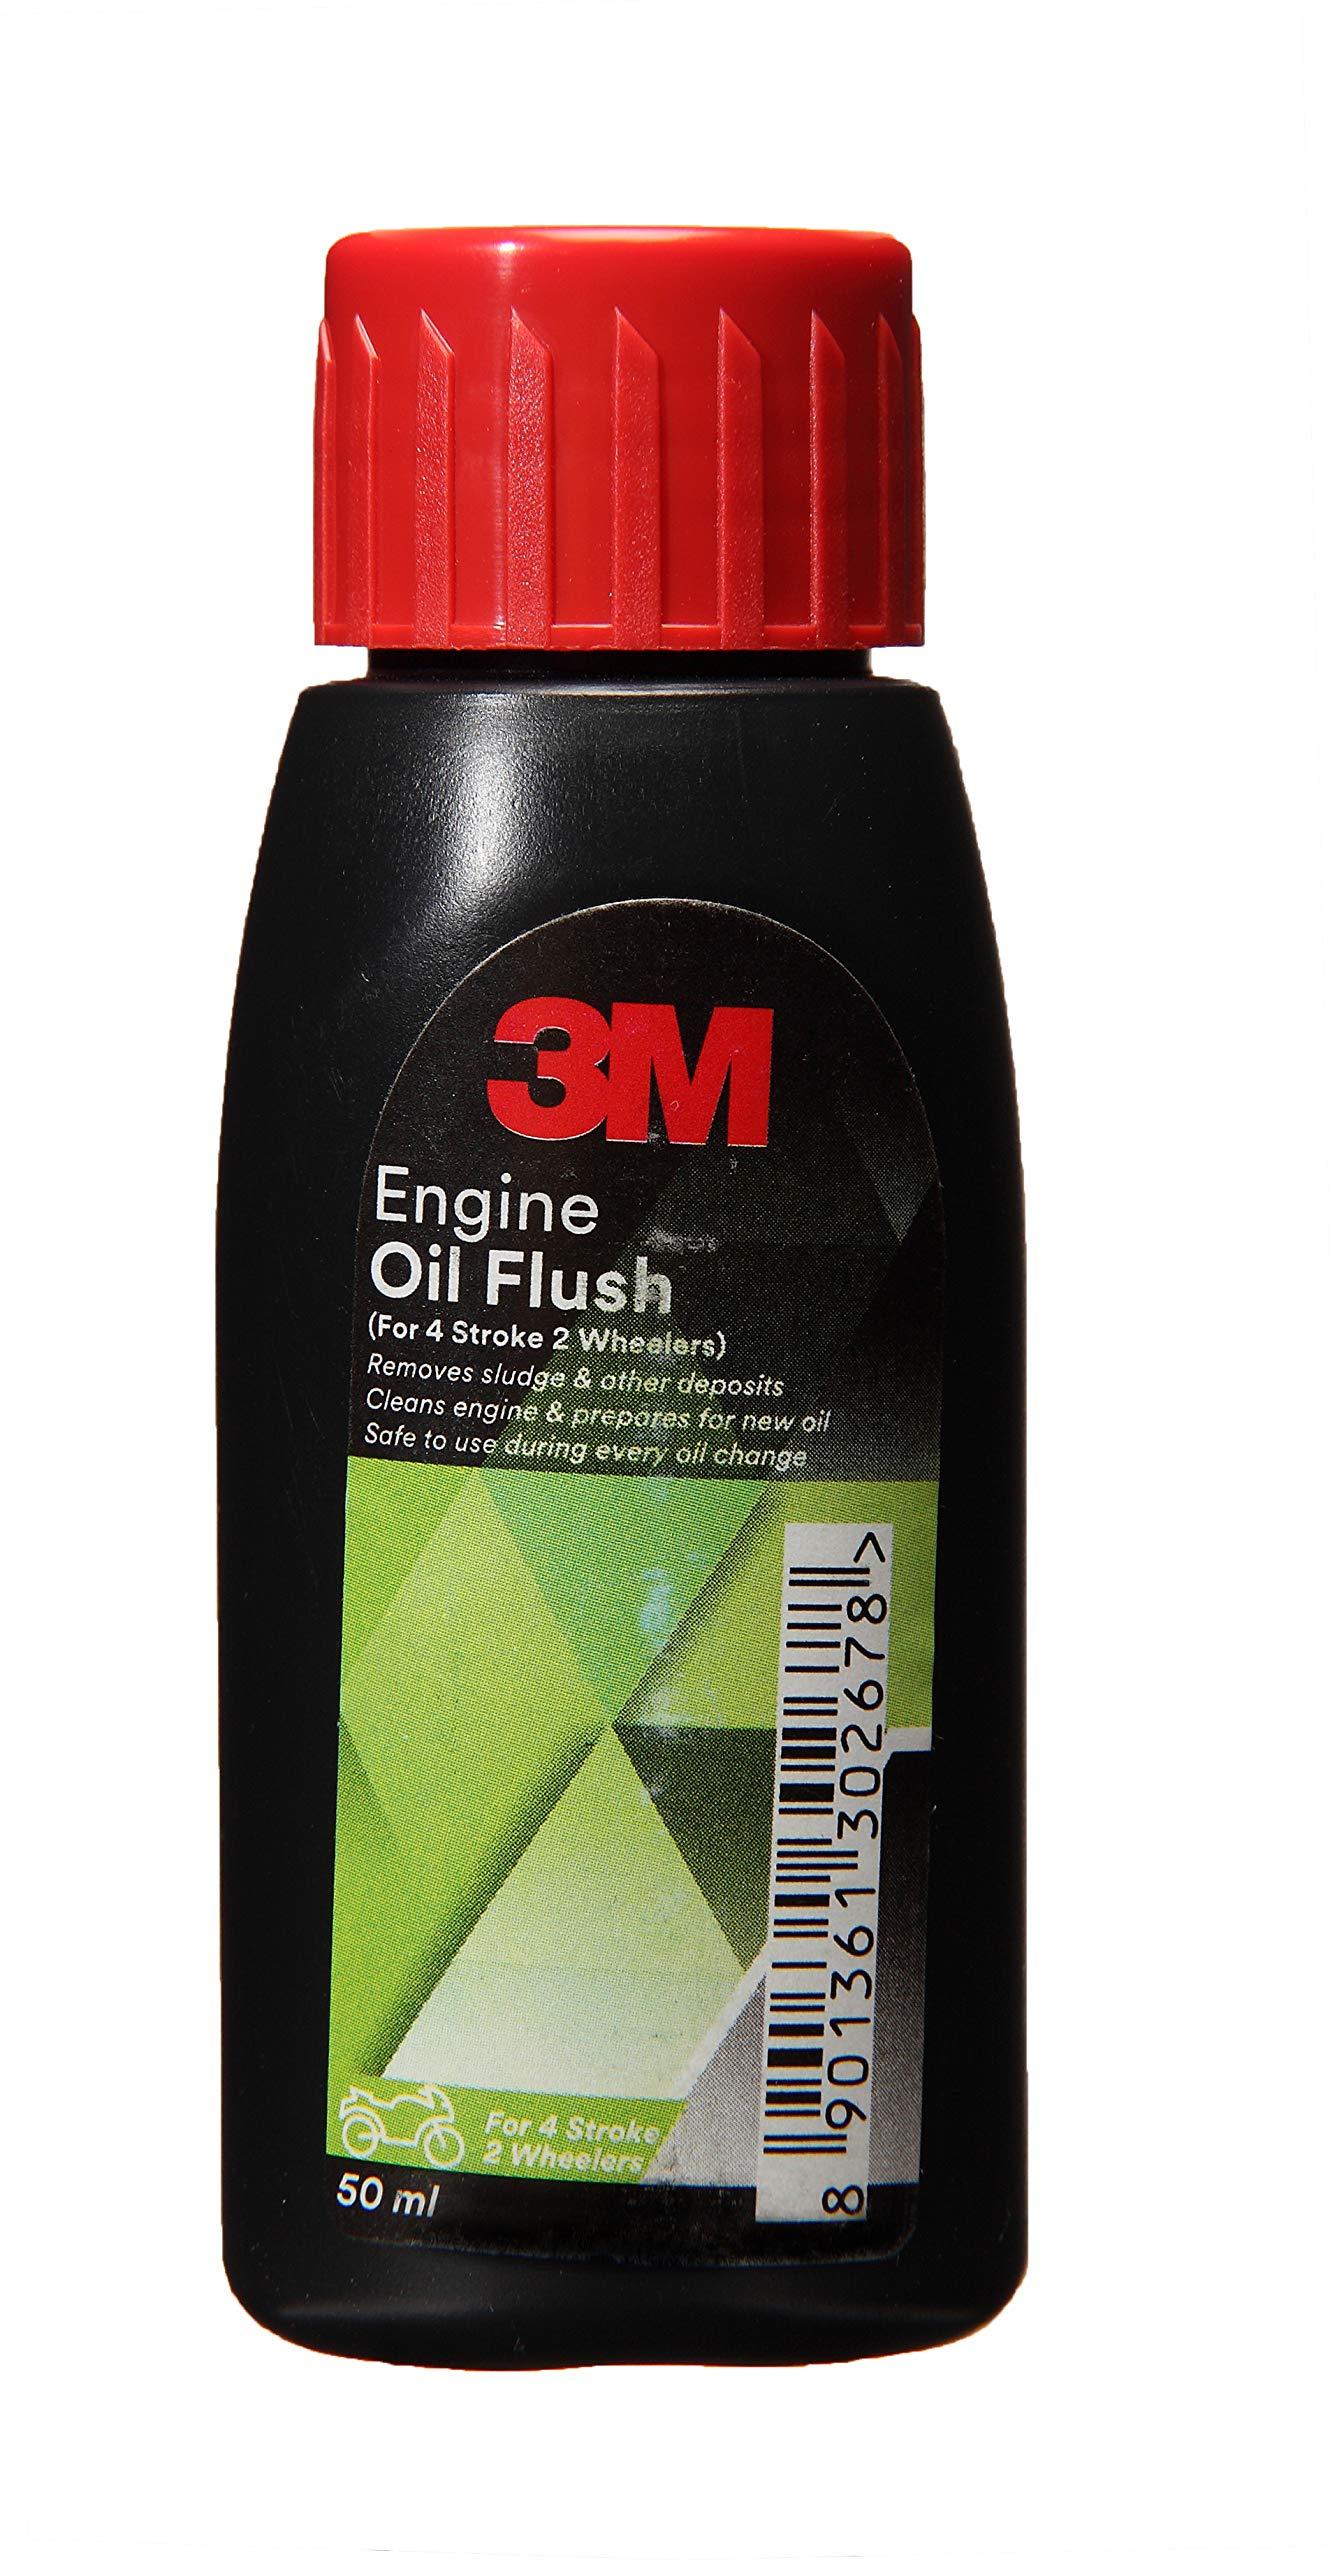 3M 2wh Engine Oil Flush (50 ml) product image